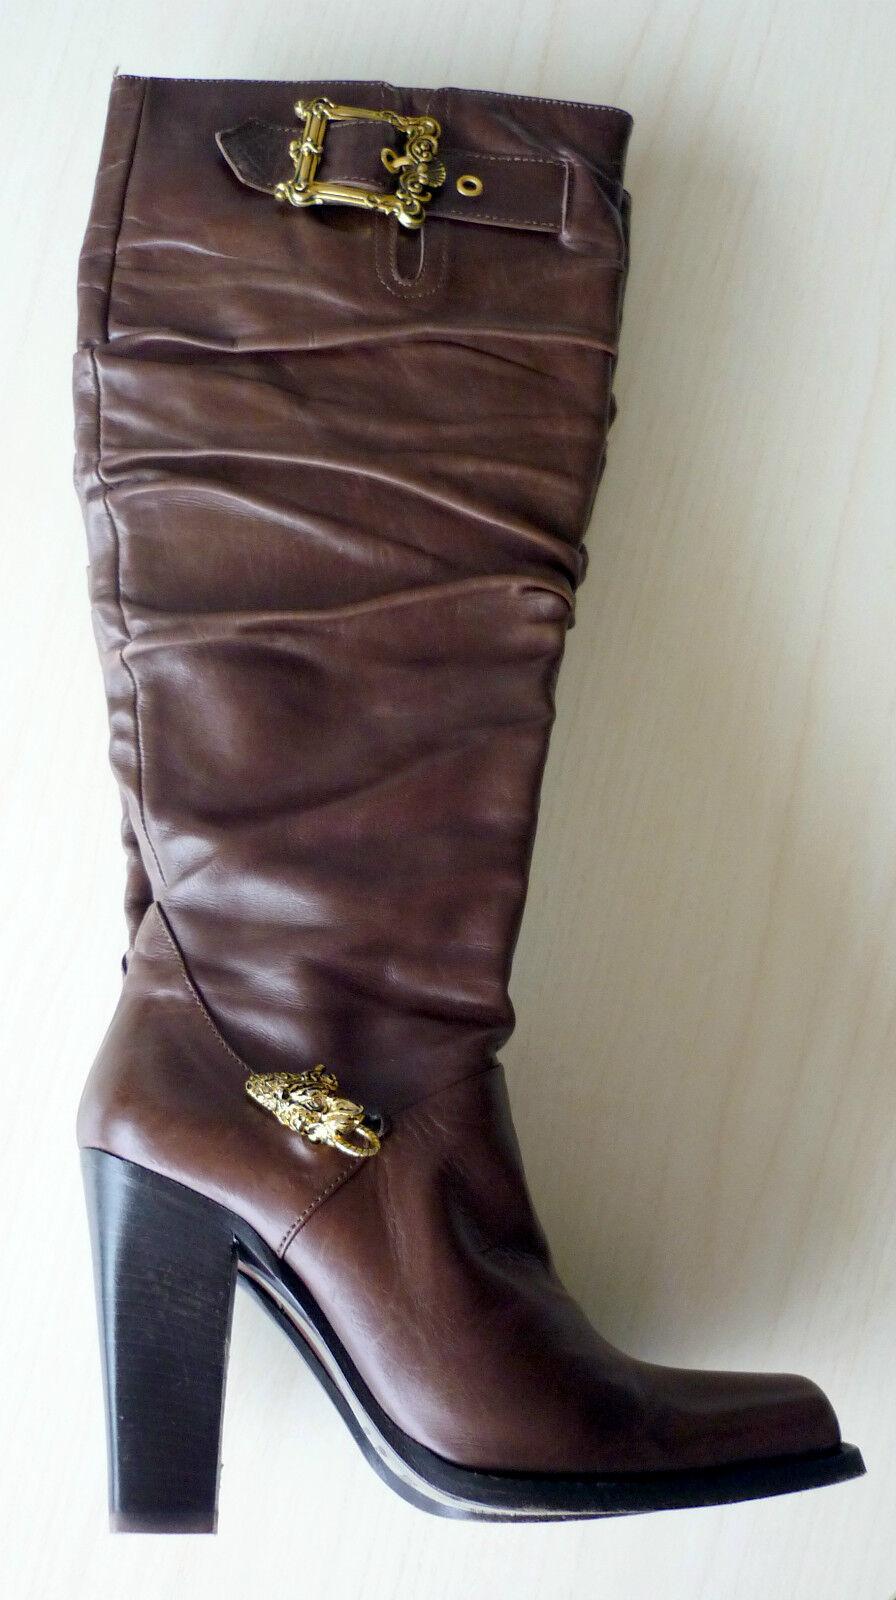 Bottes Boots Talons 35 Hauts Cuir Marron 35 Talons LE SILLA cb5916